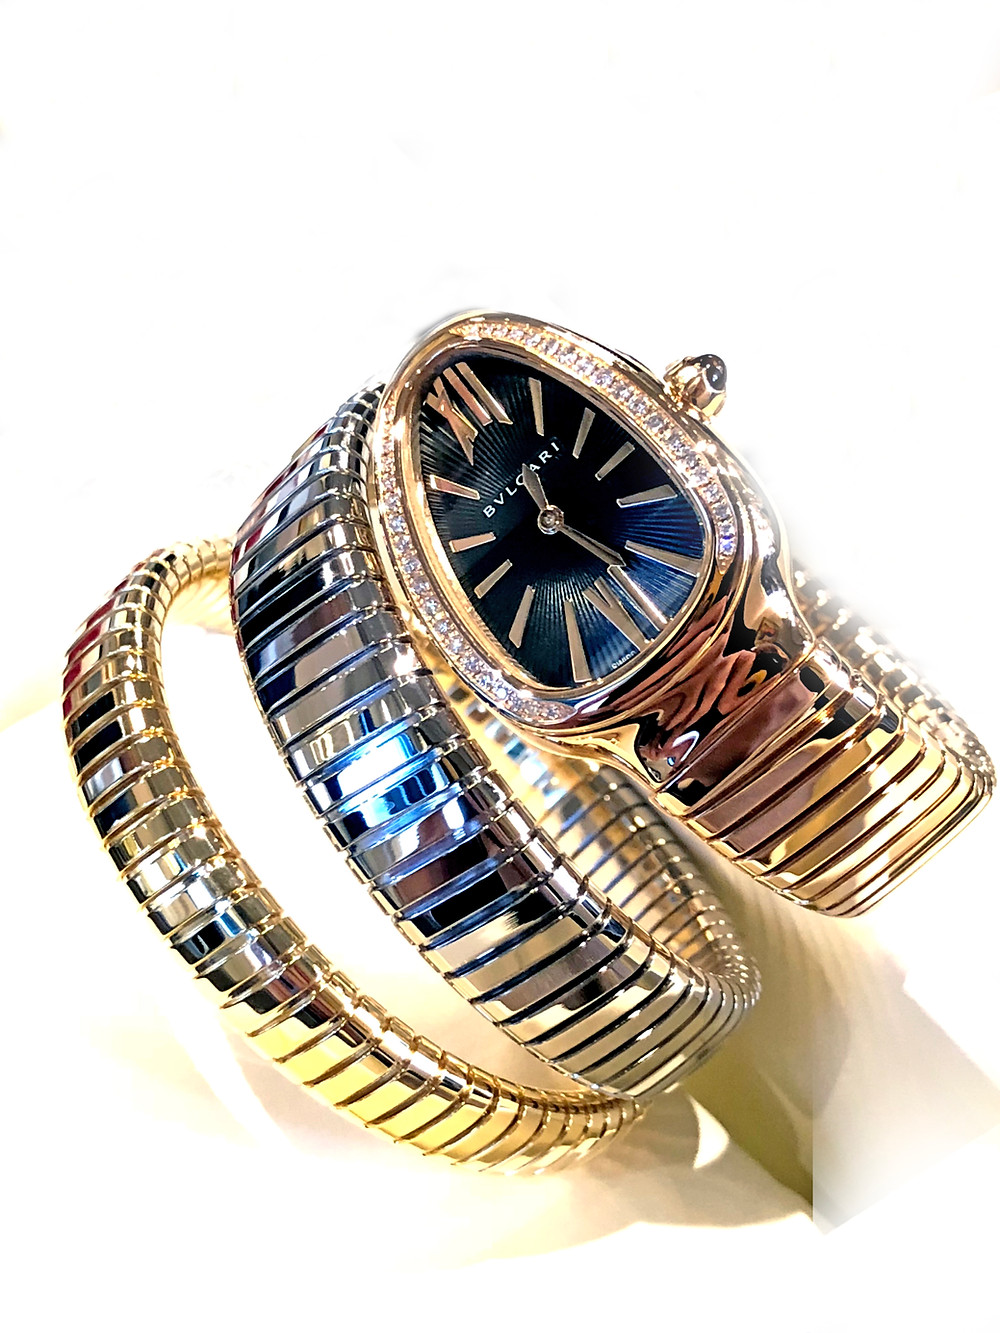 SERPENTI TUBOGAS 三色金腕錶 Tubogas雙圈手鐲結合了三種18k金顏色: 黃金、玫瑰金與白金;18k玫瑰金35毫米錶殼搭配一個鑲滿明亮式切割美鑽的錶圈/搭載BVLGARI專有高精確度石英機芯